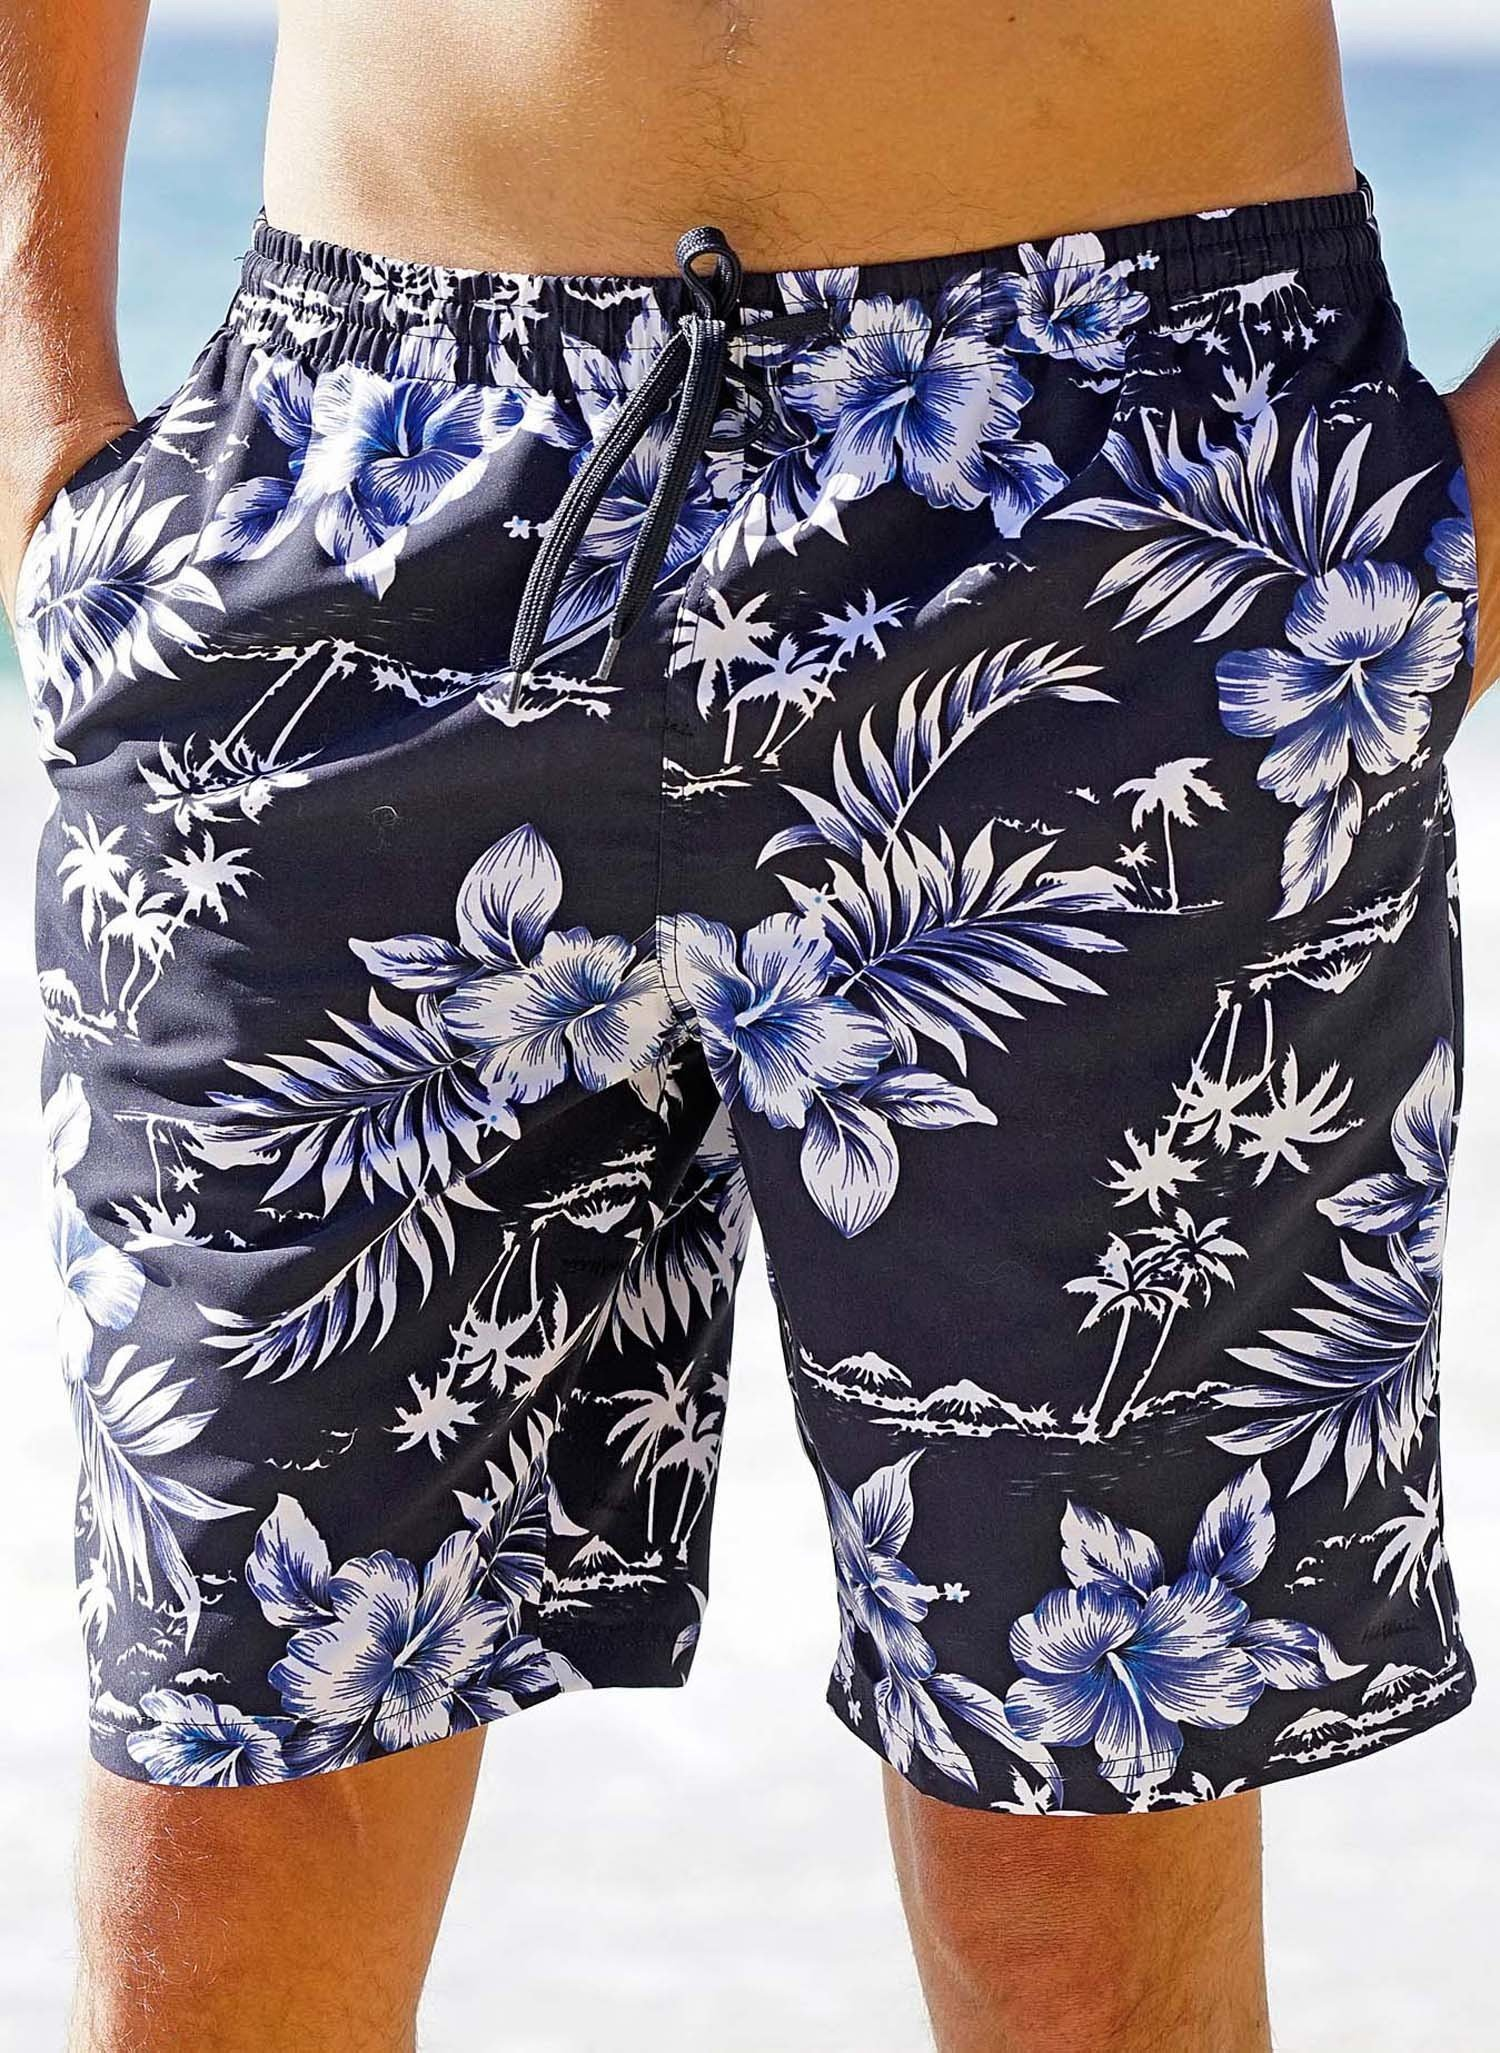 H-Bade-Shorts,HAWAII blau M 047 - 1 - Ronja.ch